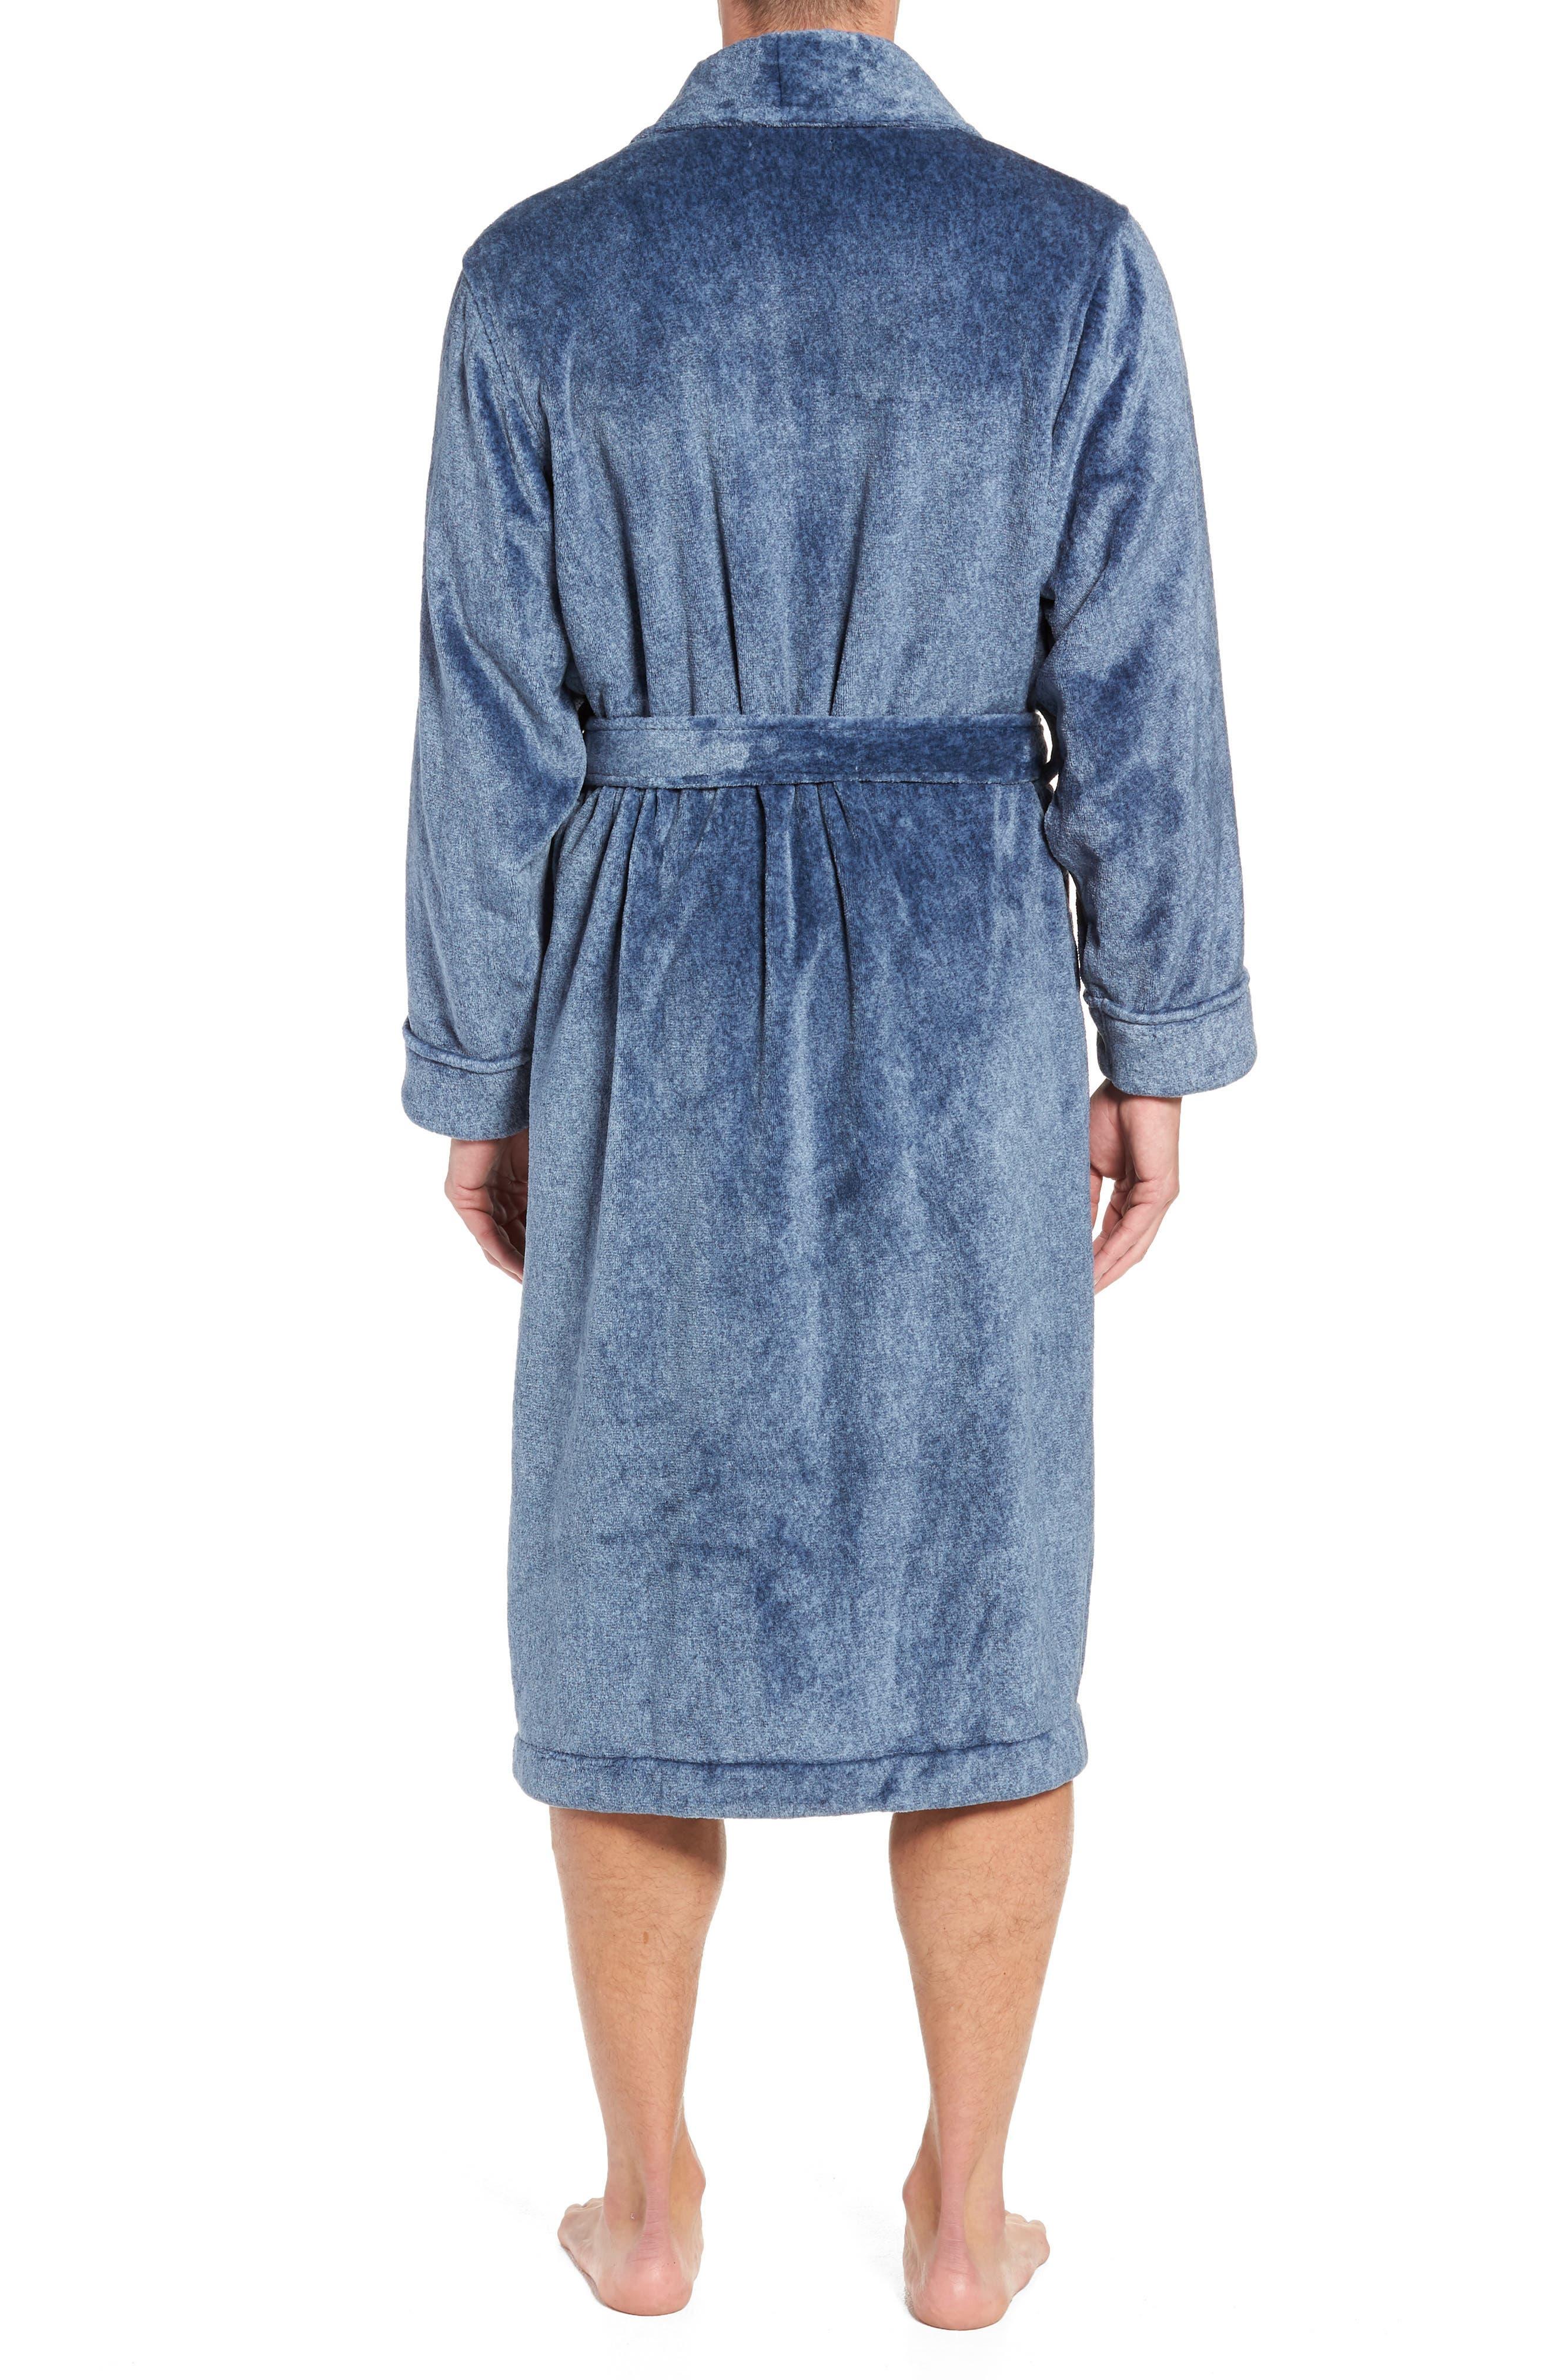 Heathered Fleece Robe,                             Alternate thumbnail 2, color,                             BLUE CORONET